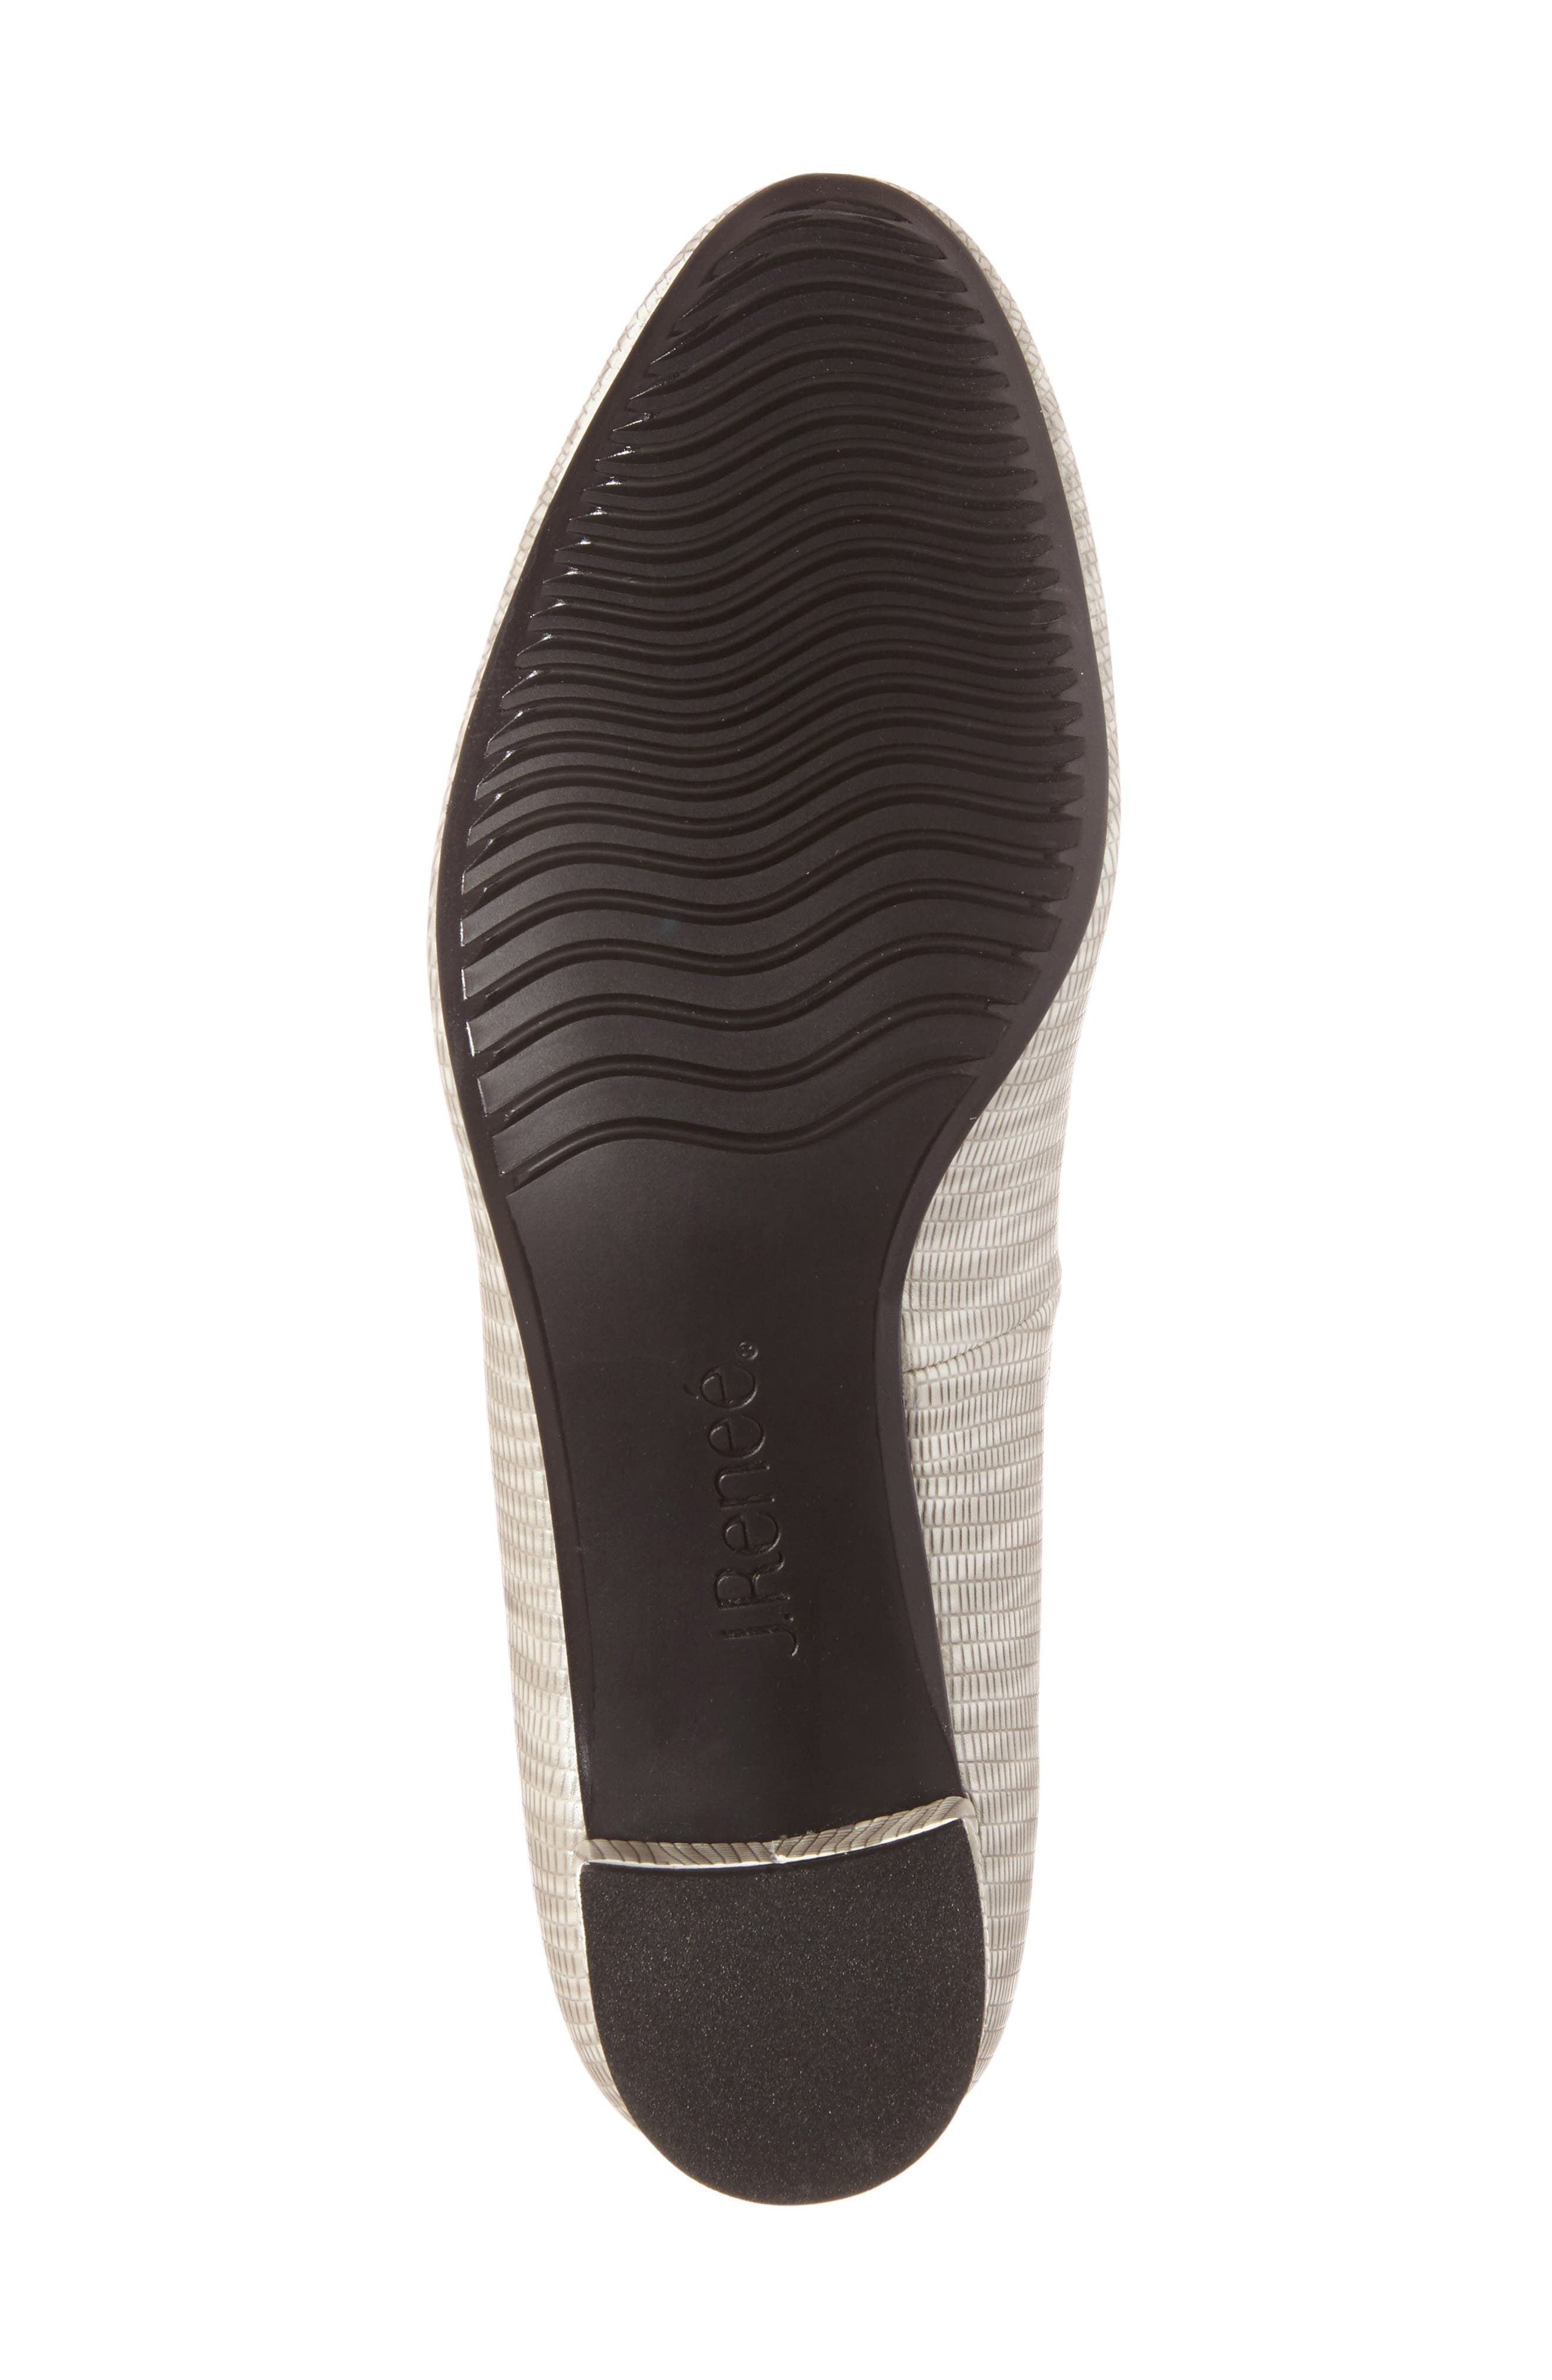 Bambalina Block Heel Pump,                             Alternate thumbnail 4, color,                             GREY METALLIC FAUX LEATHER